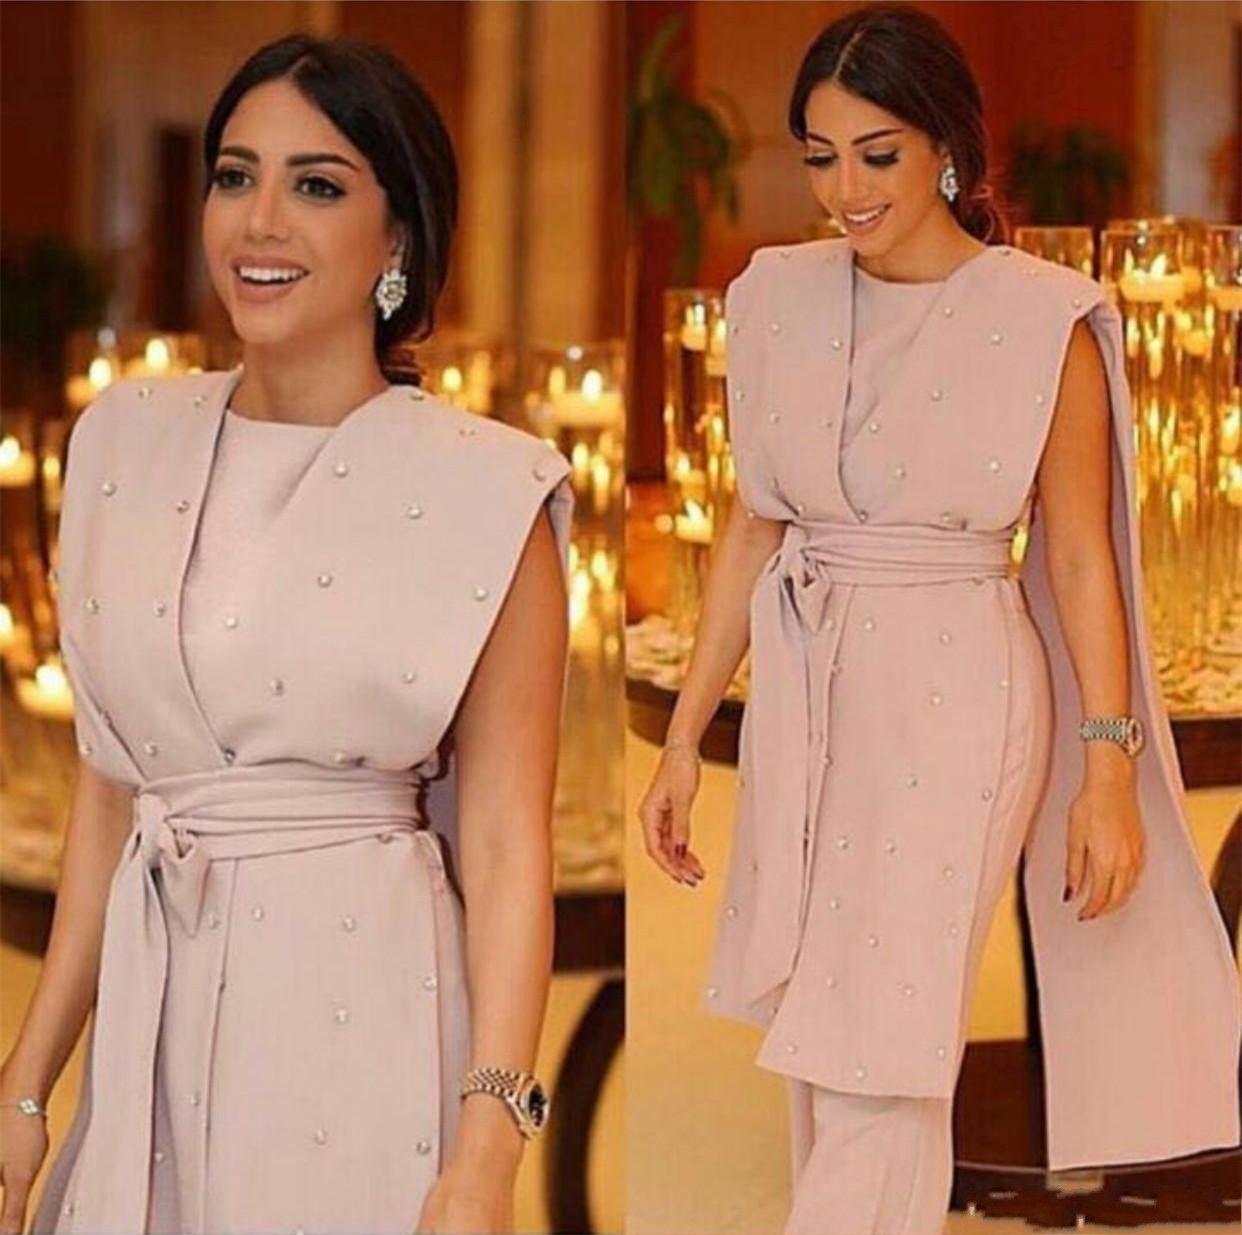 2018 Elegant Formal Dresses Evening Wear Cape Drapped Sashes Jumpsuit Belts Modern Crepe Suit Party Prom Gowns Robes de cocktail